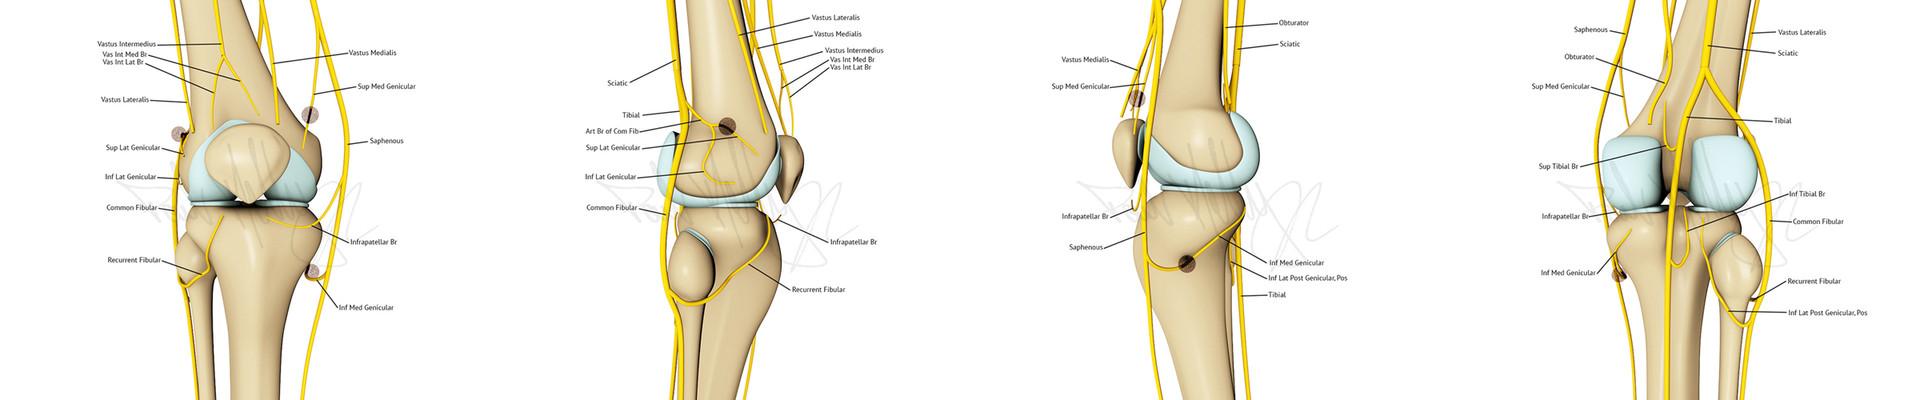 Knee Innervation spread 1